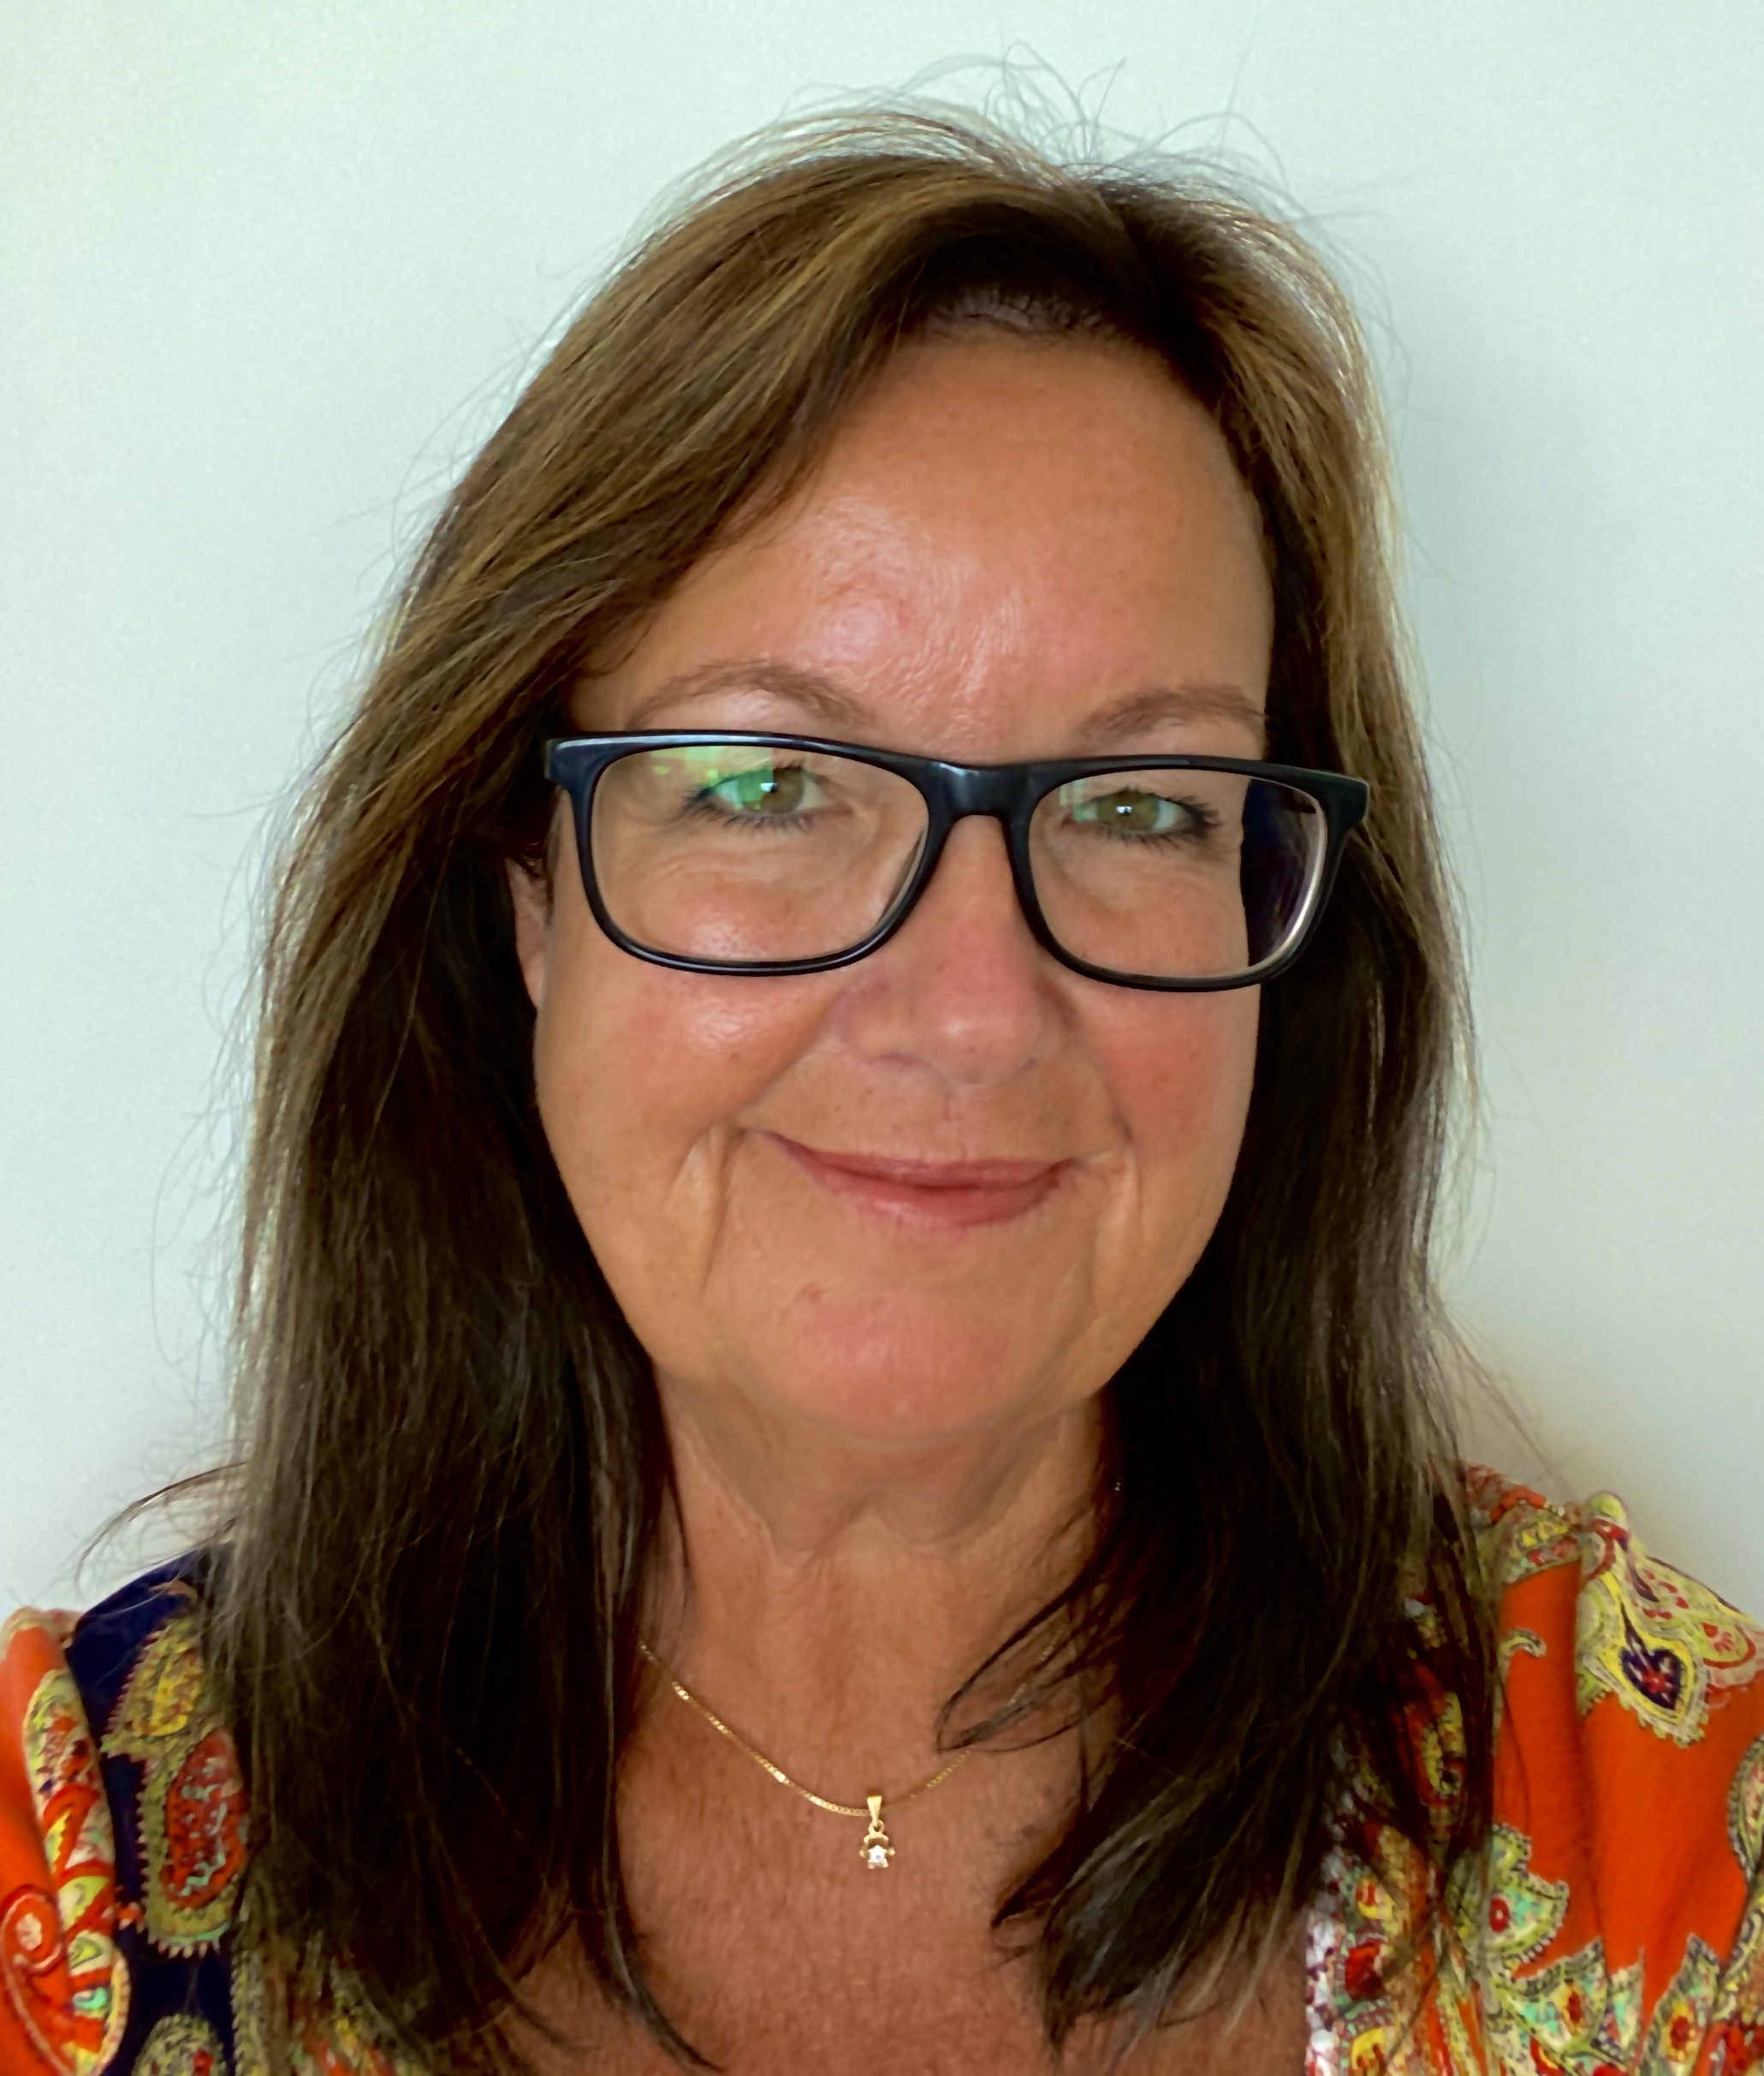 Susanne Siggelin